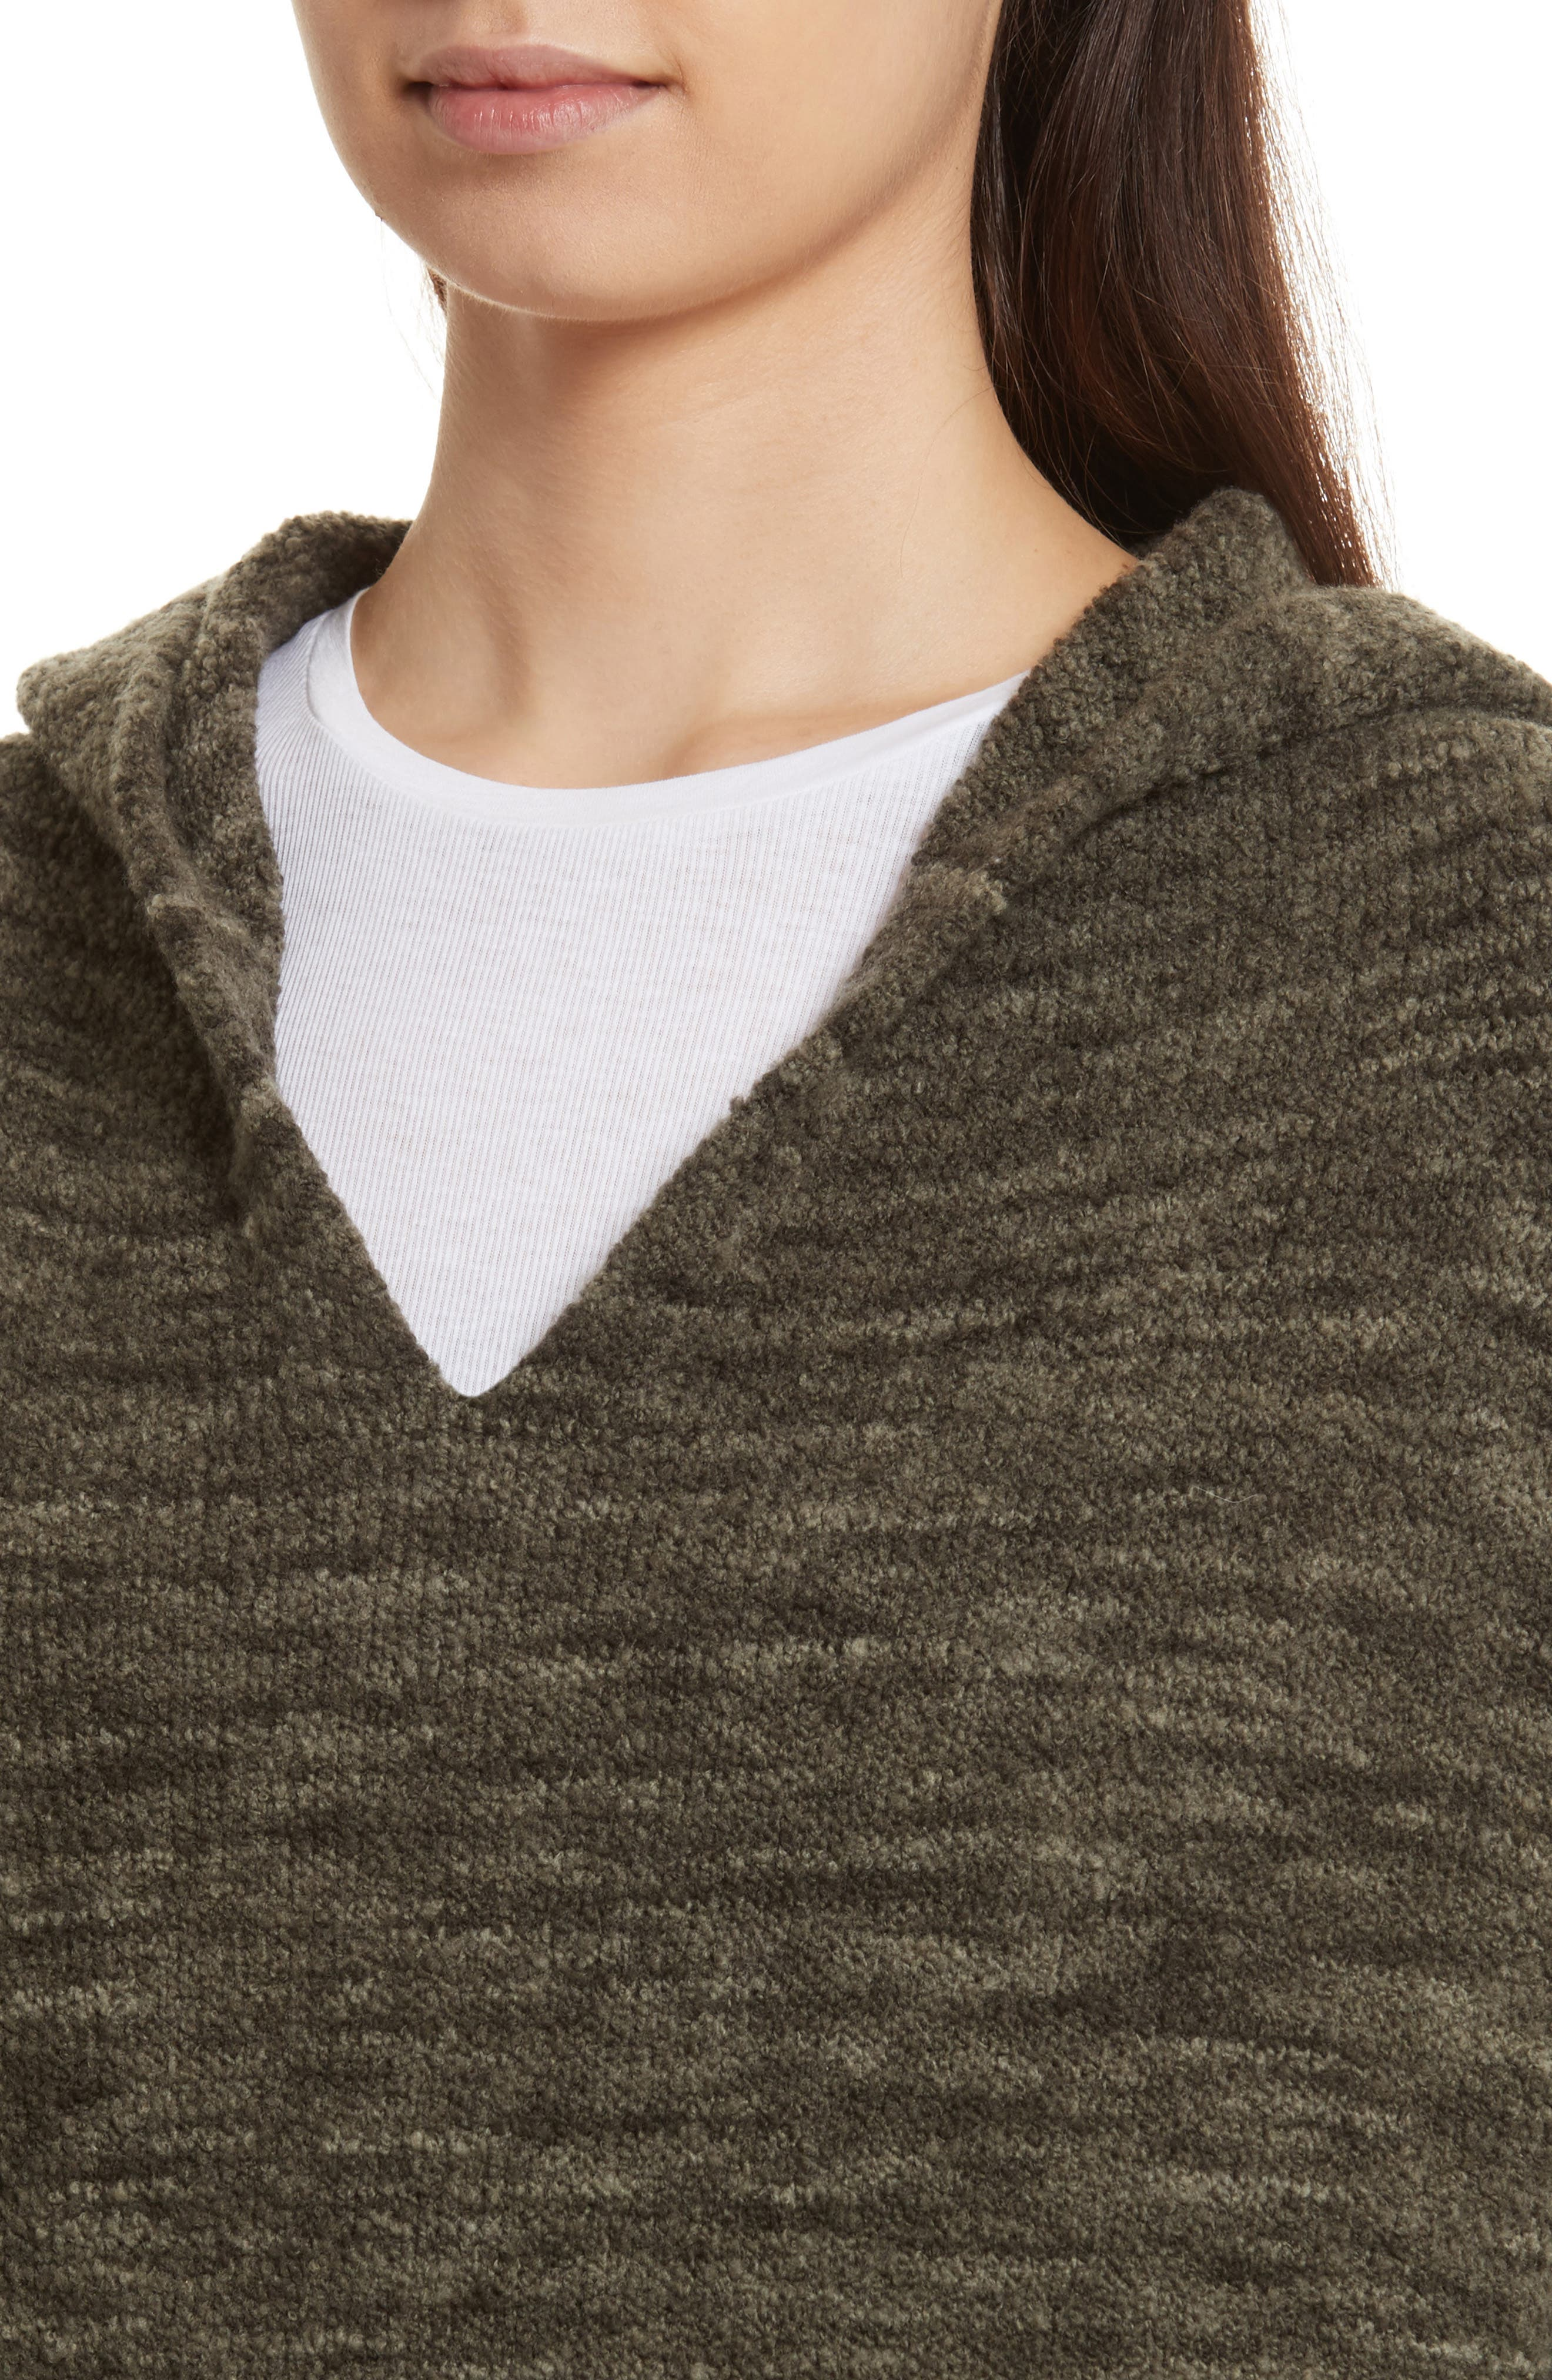 Space Dye Hoodie Sweater,                             Alternate thumbnail 4, color,                             343